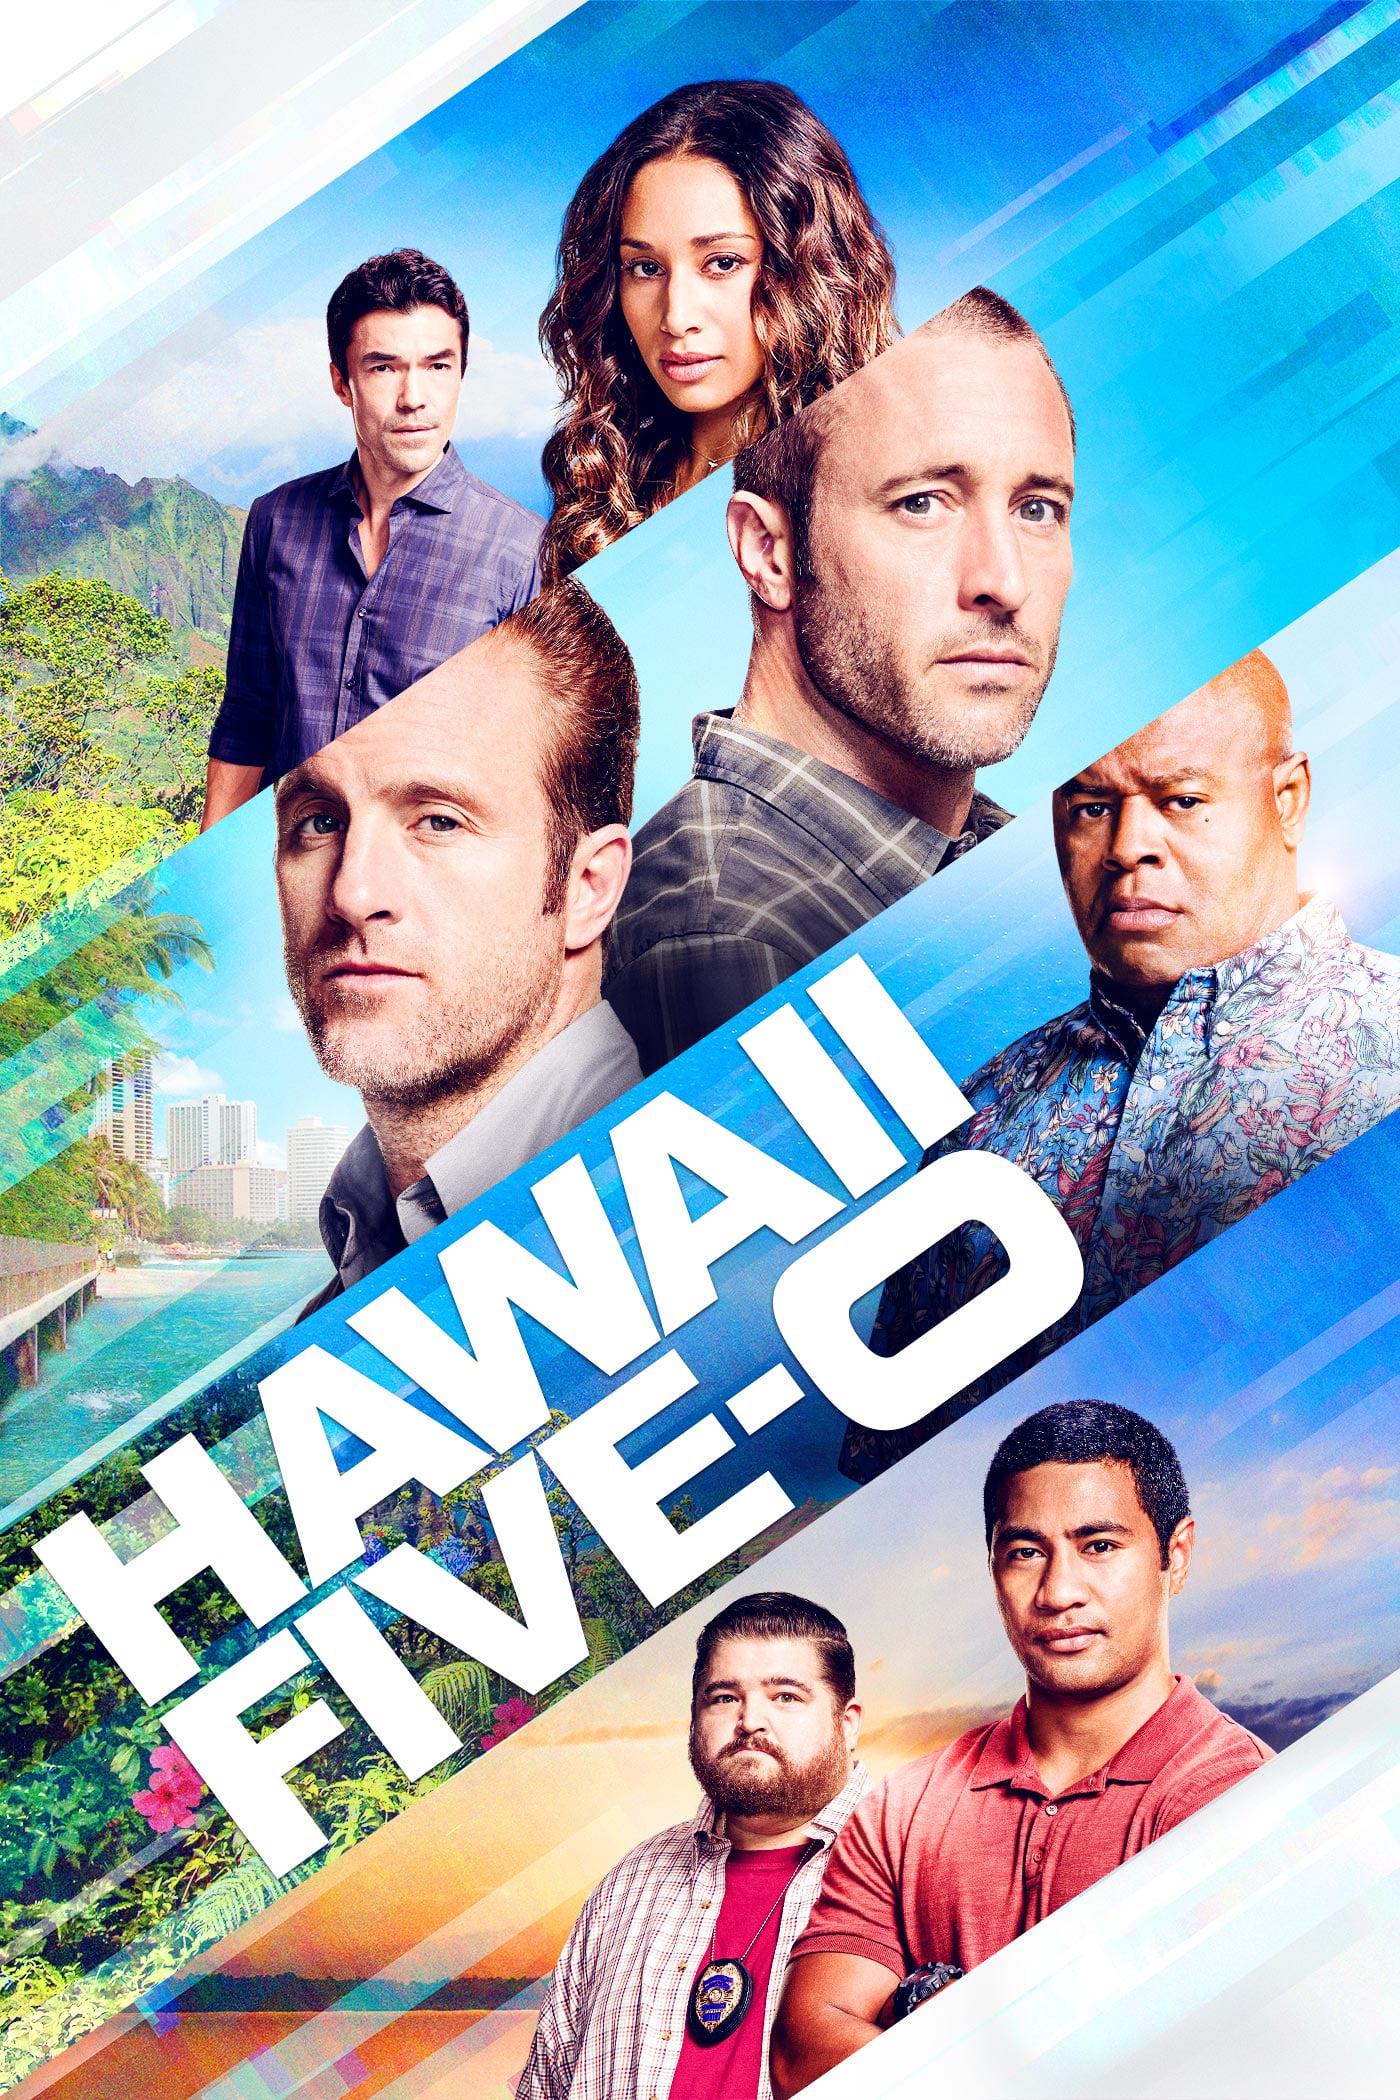 Hawaii.Five-0.2010.S10E16.720p.HDTV.x264-KILLERS